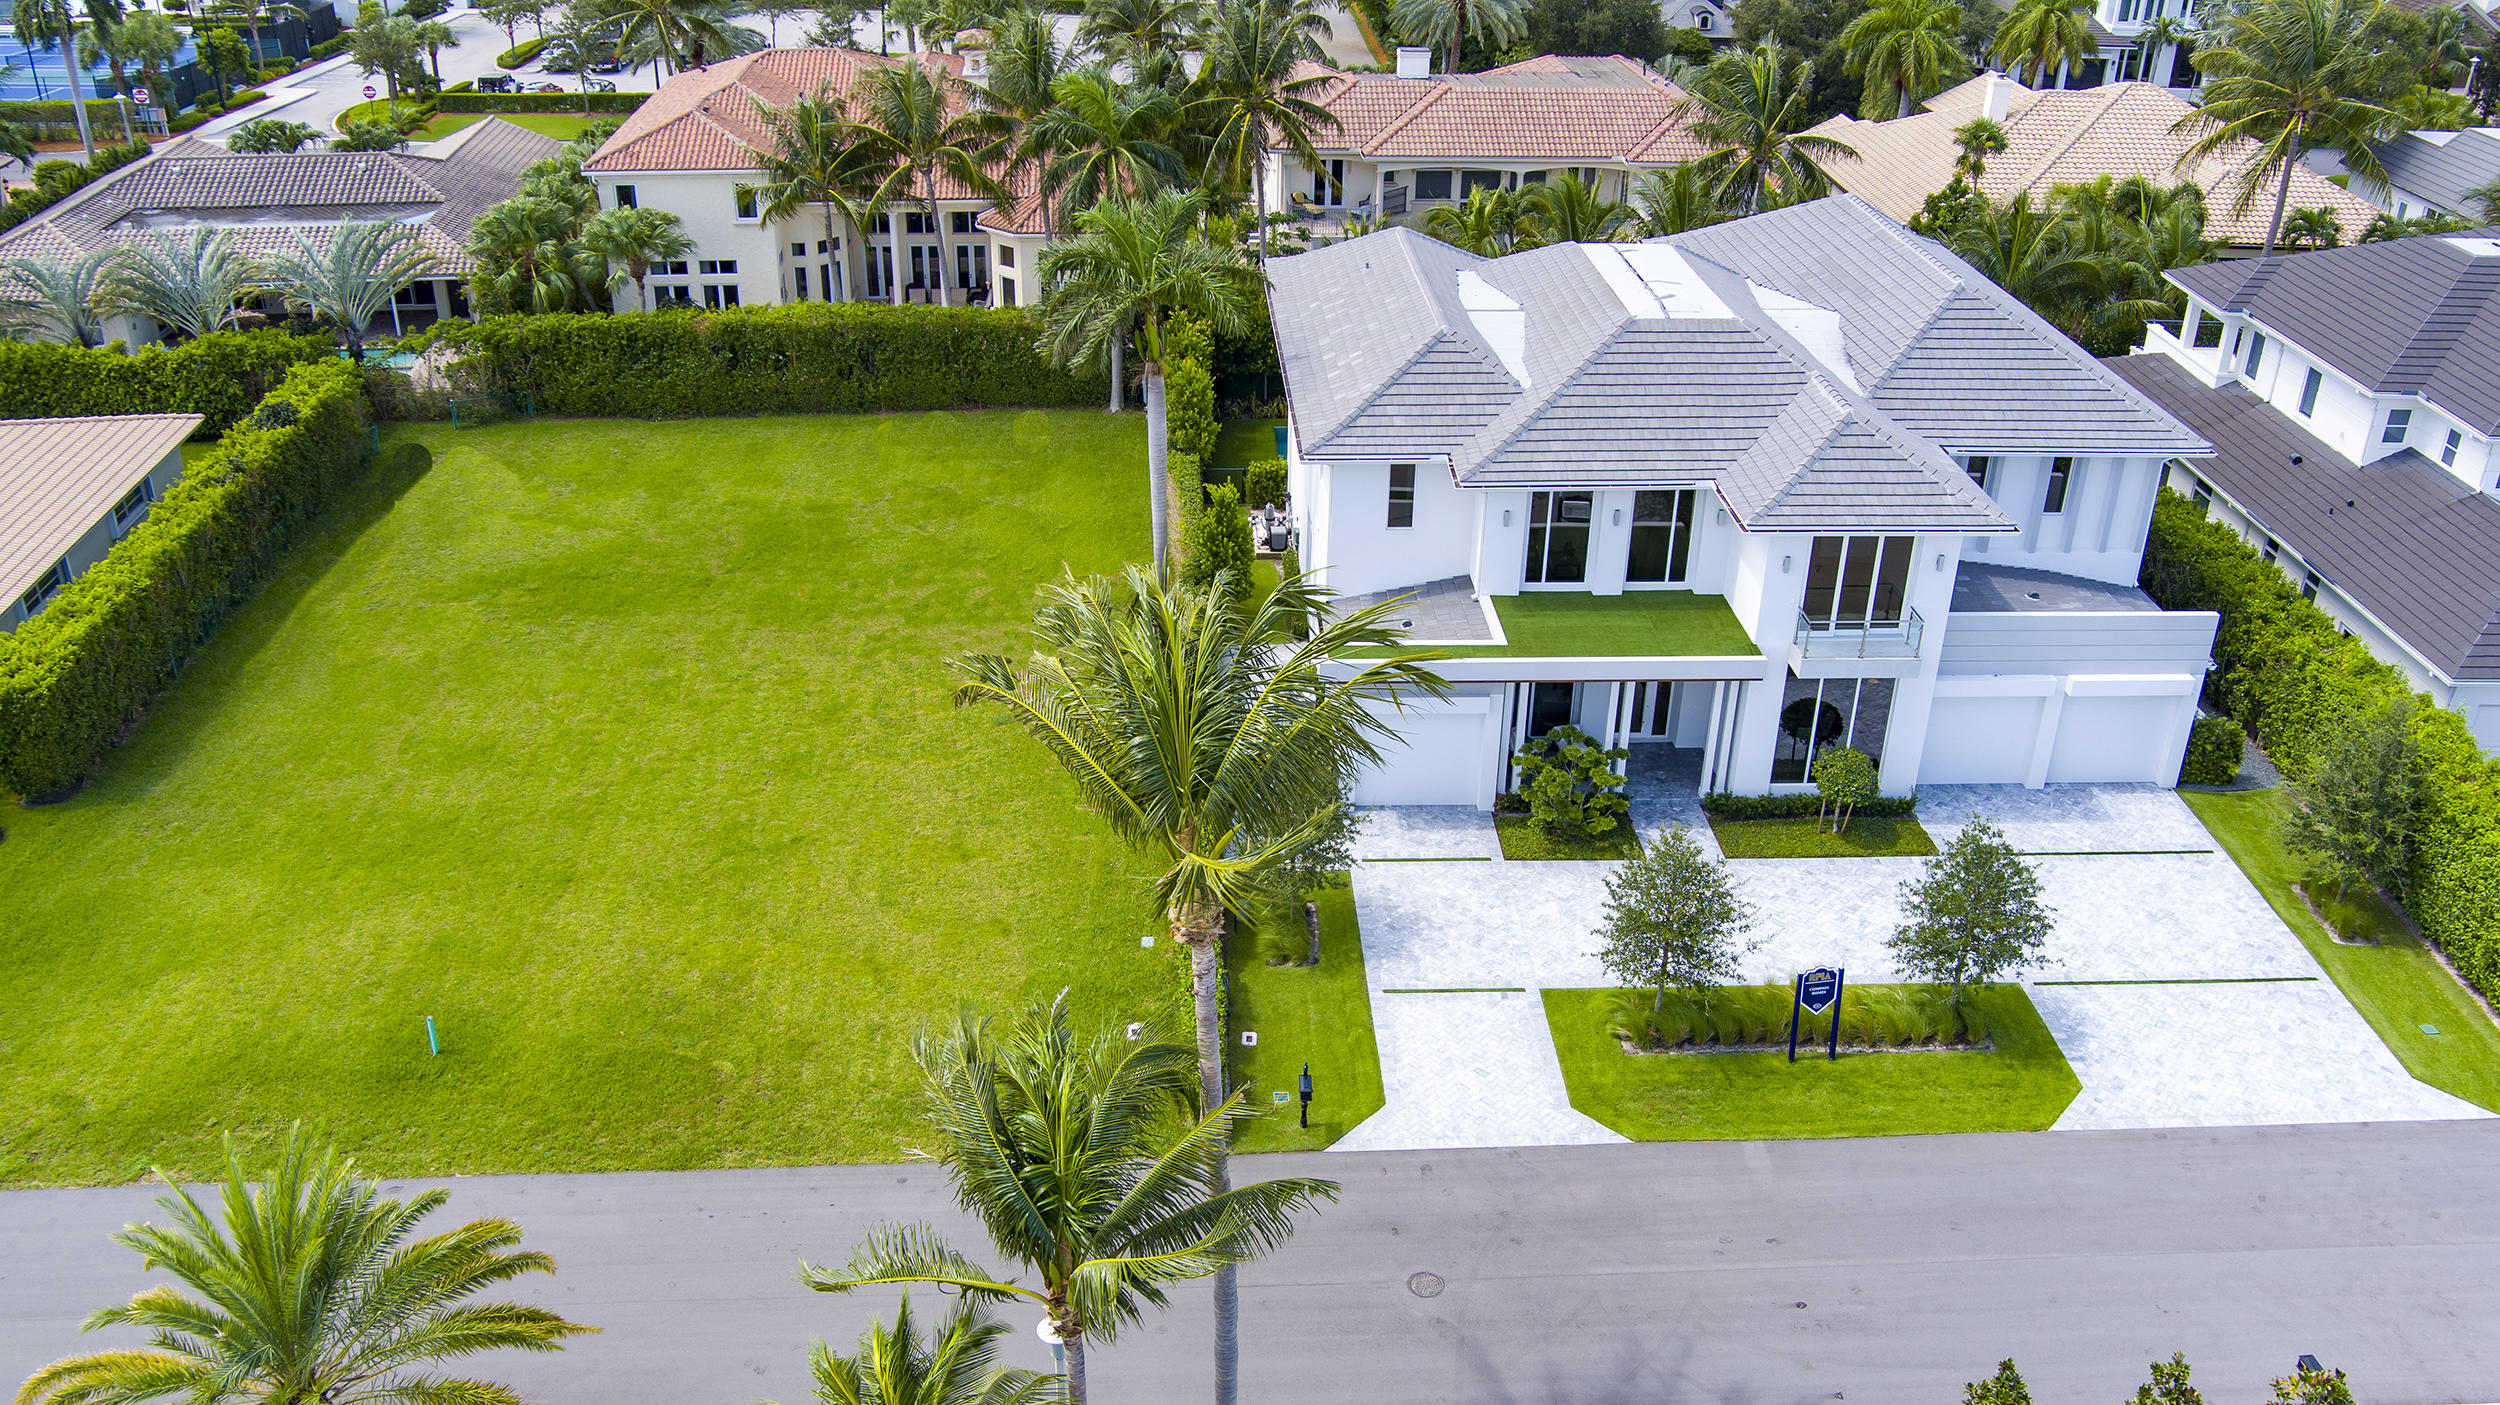 Photo of 2379-2361 W Silver Palm Road, Boca Raton, FL 33432